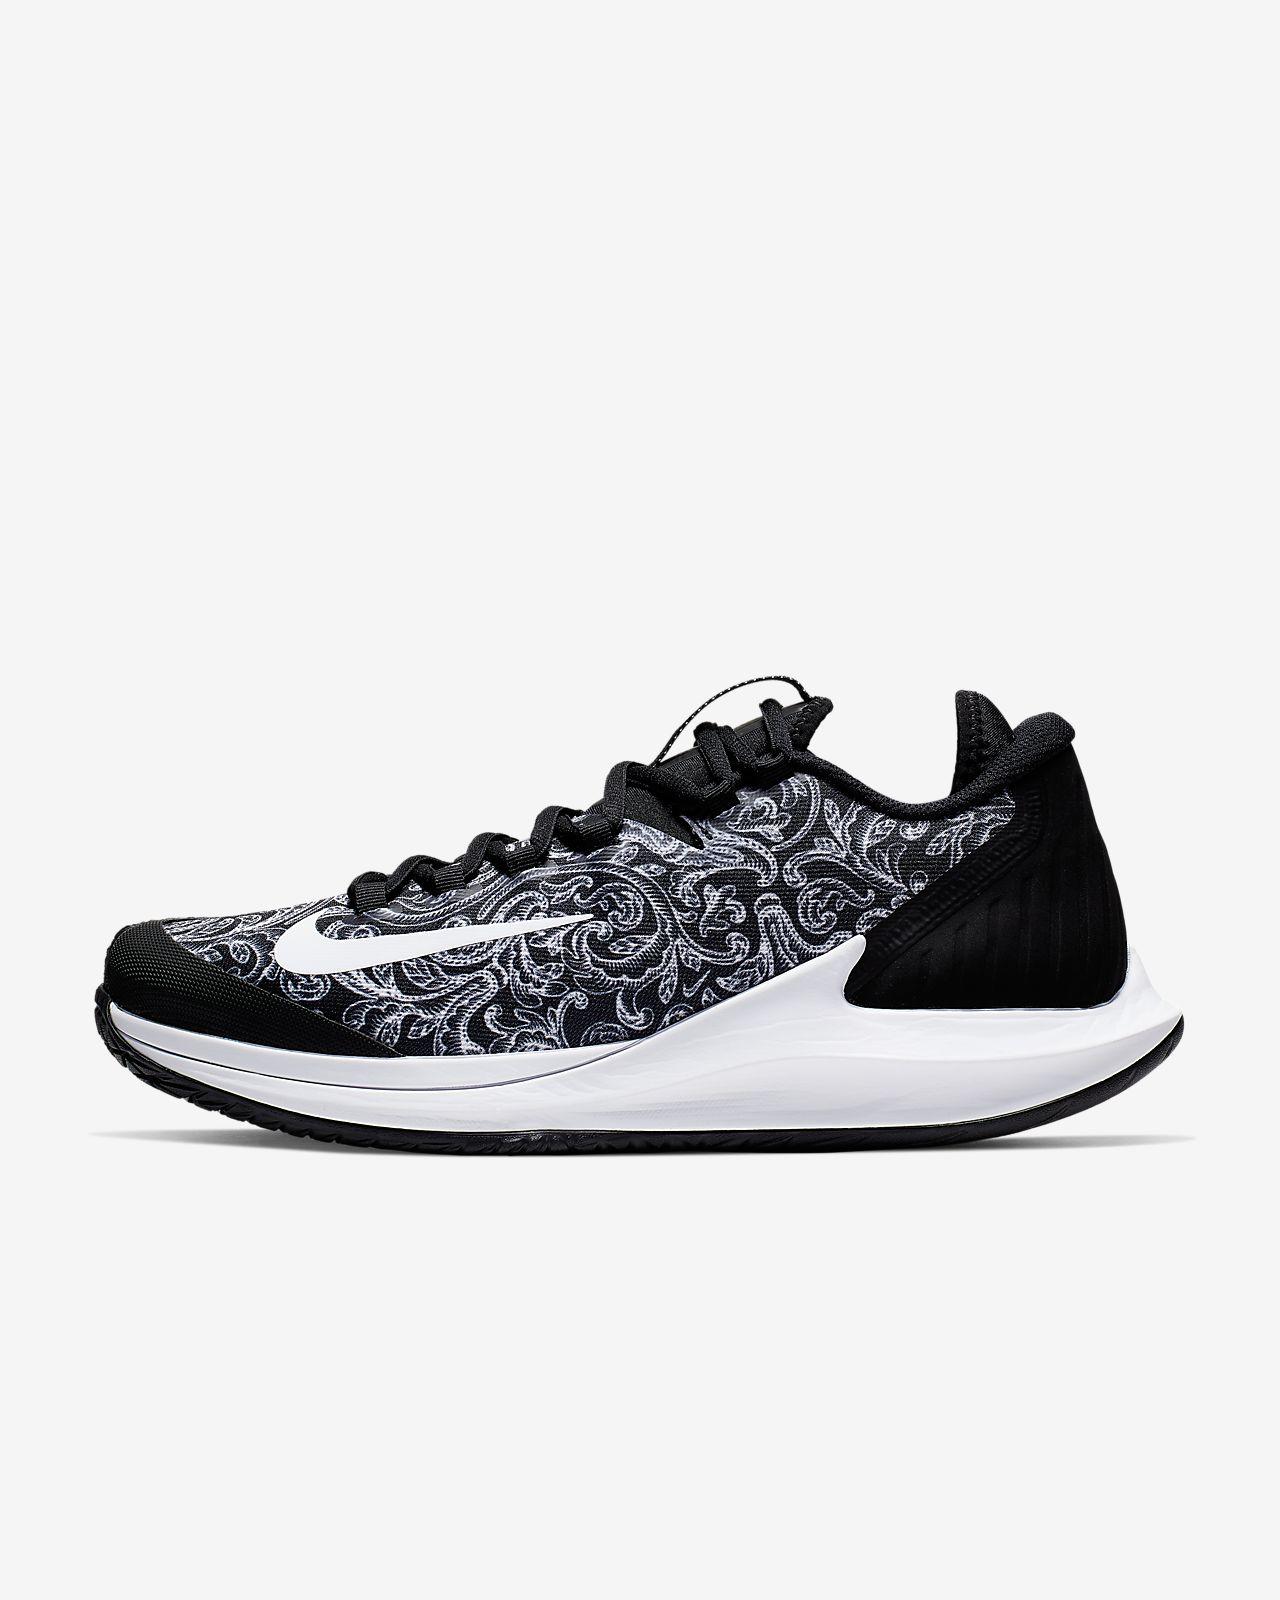 d91abd5272e68 NikeCourt Air Zoom Zero Men s Tennis Shoe. Nike.com GB